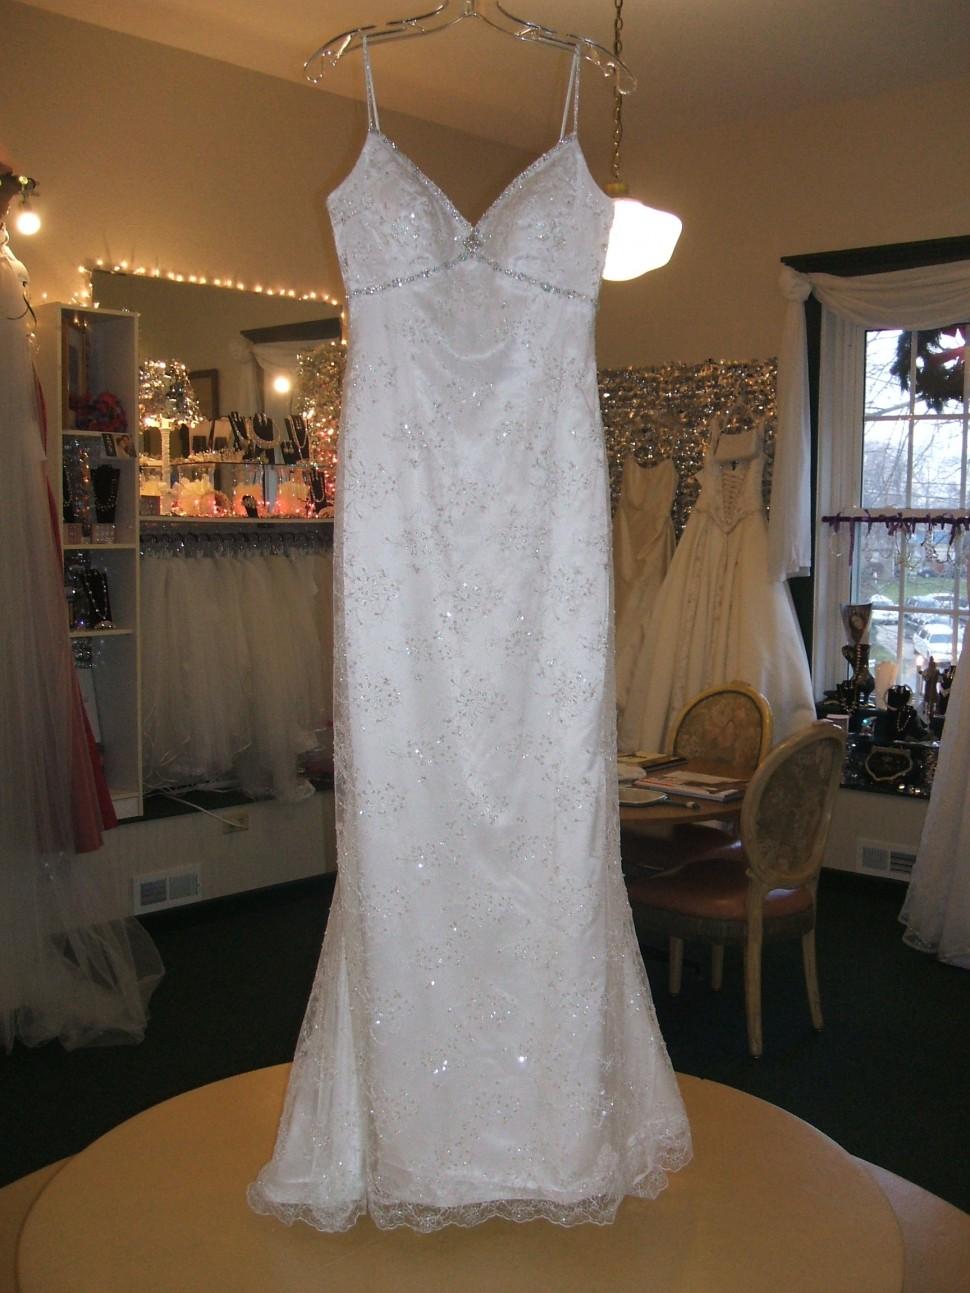 wedding dresses consignment stores photo - 1